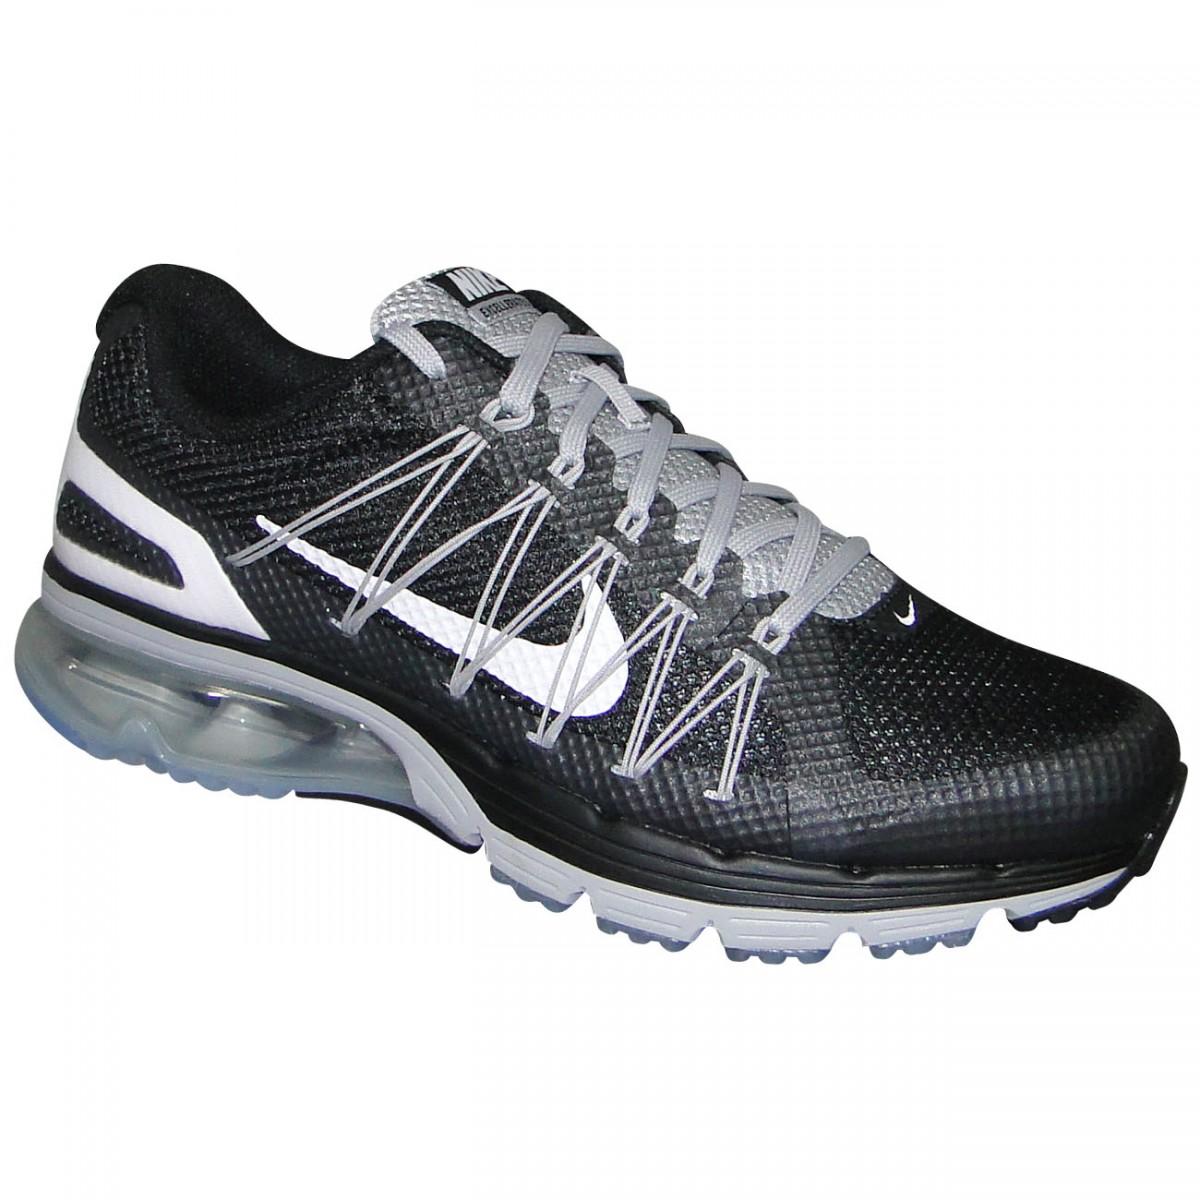 huge selection of 0d6b9 b4d74 Tenis Nike Air Max Excellerate 3.